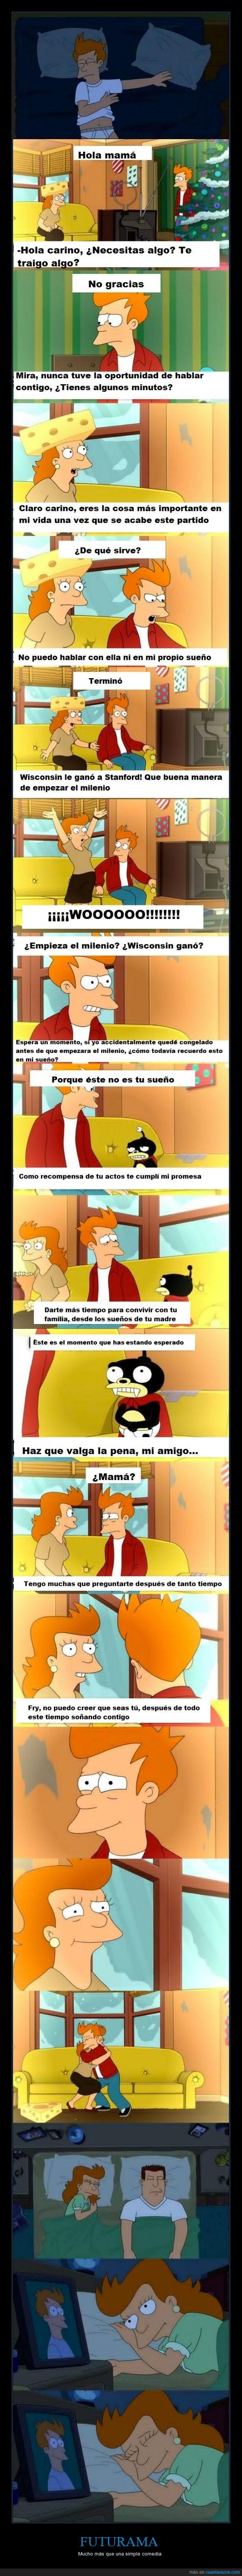 amor,Fry,Futurama,madre,mamá,Matt Groening,mileno,serie,sueño